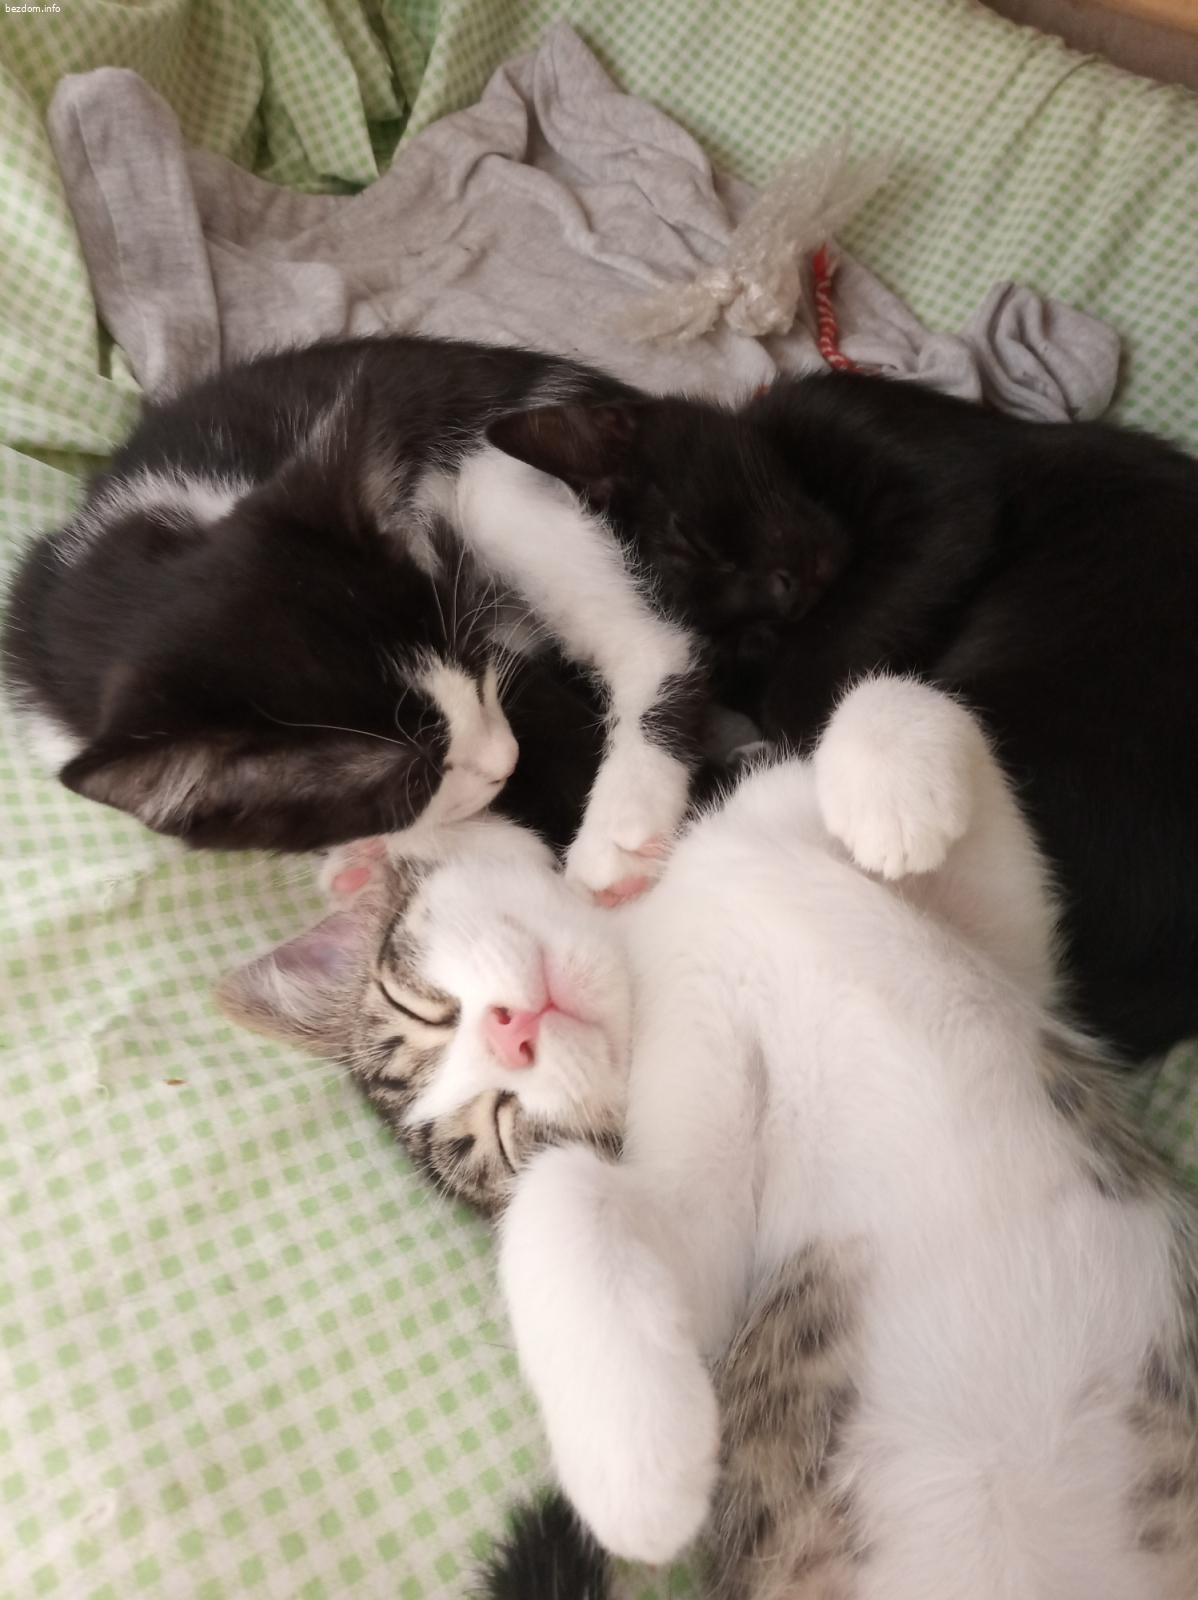 Кити, Нера и Снупи - в очакване на приключения и уютен дом